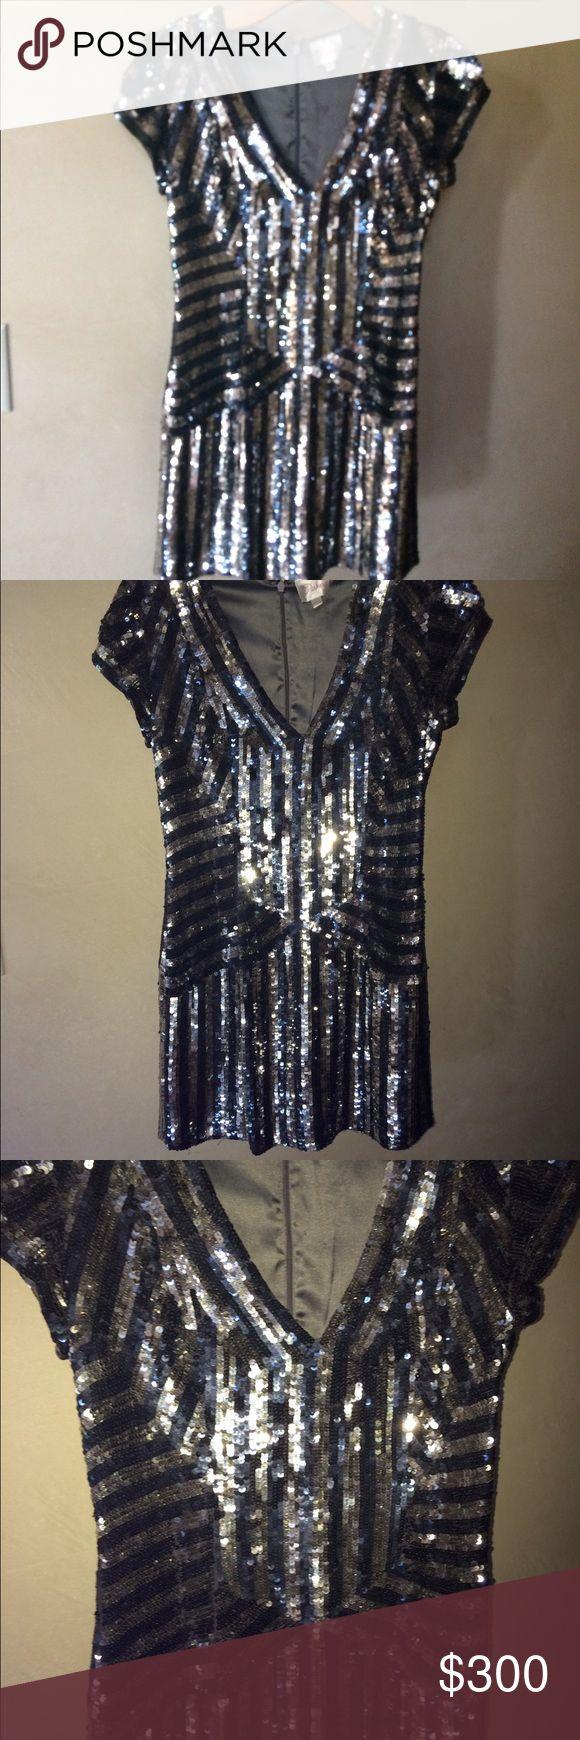 Haute Hippie sequence dress size small Haute Hippie sequence dress size small. Measures 31 inches in length. Lining is 100% silk. Haute Hippie Dresses Mini